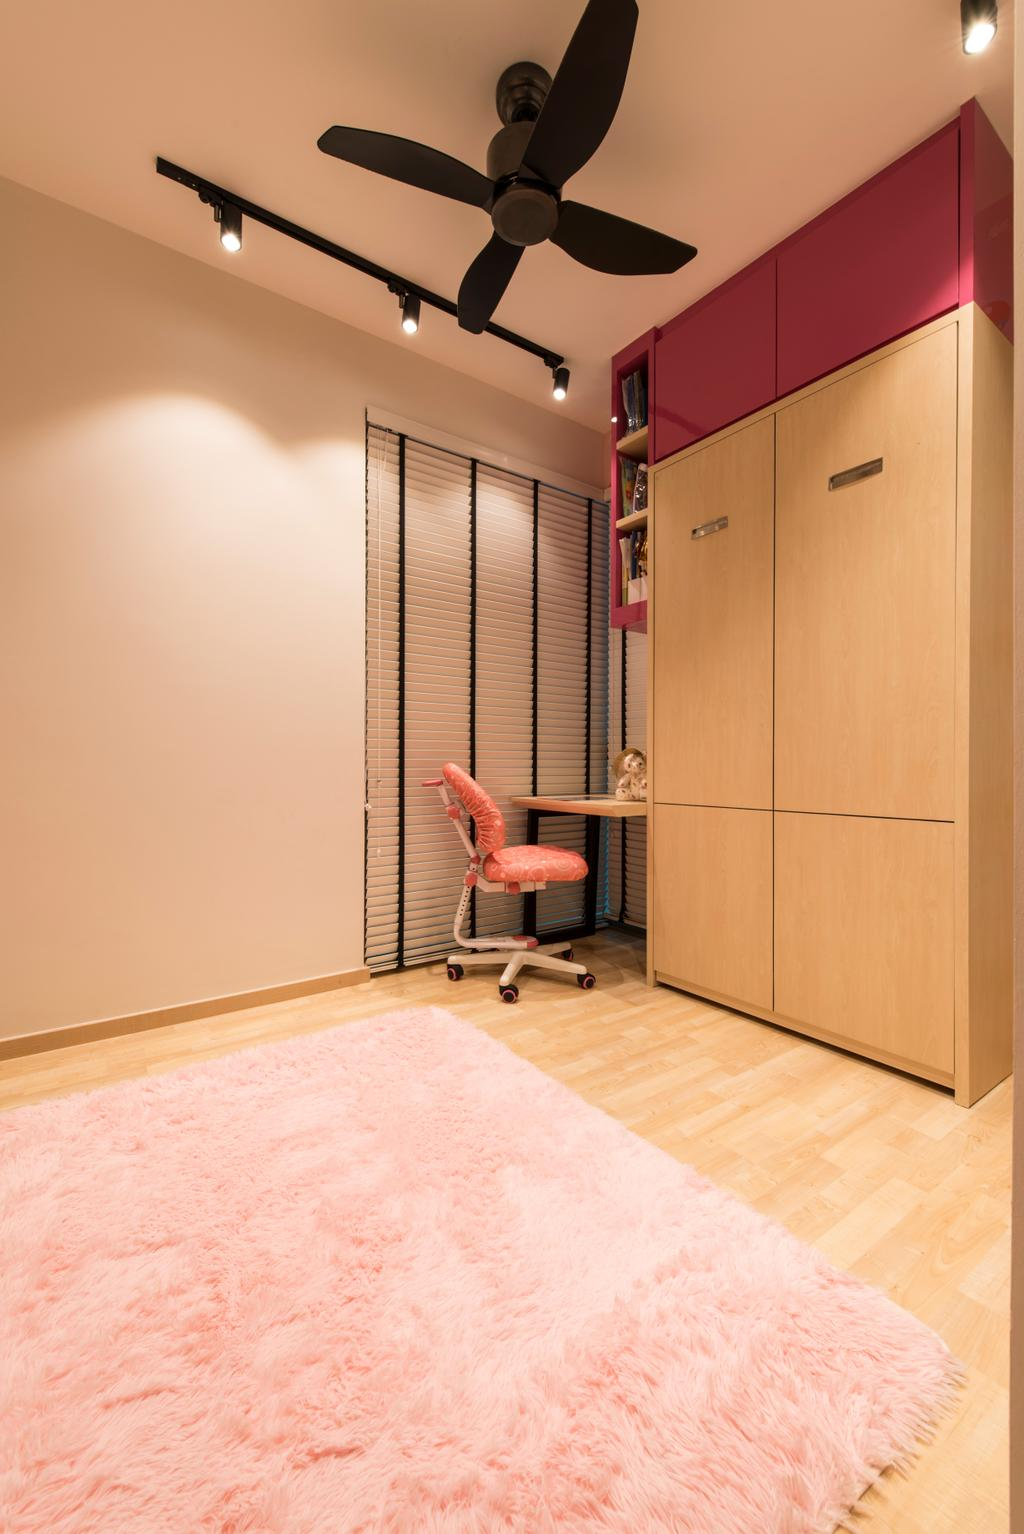 Contemporary, Condo, Bedroom, Ripple Bay, Interior Designer, VNA Design, Pink Rug, Black Track Lights, Wood Cupboard, Study Des, White Venetian Blinds, Wood Floor